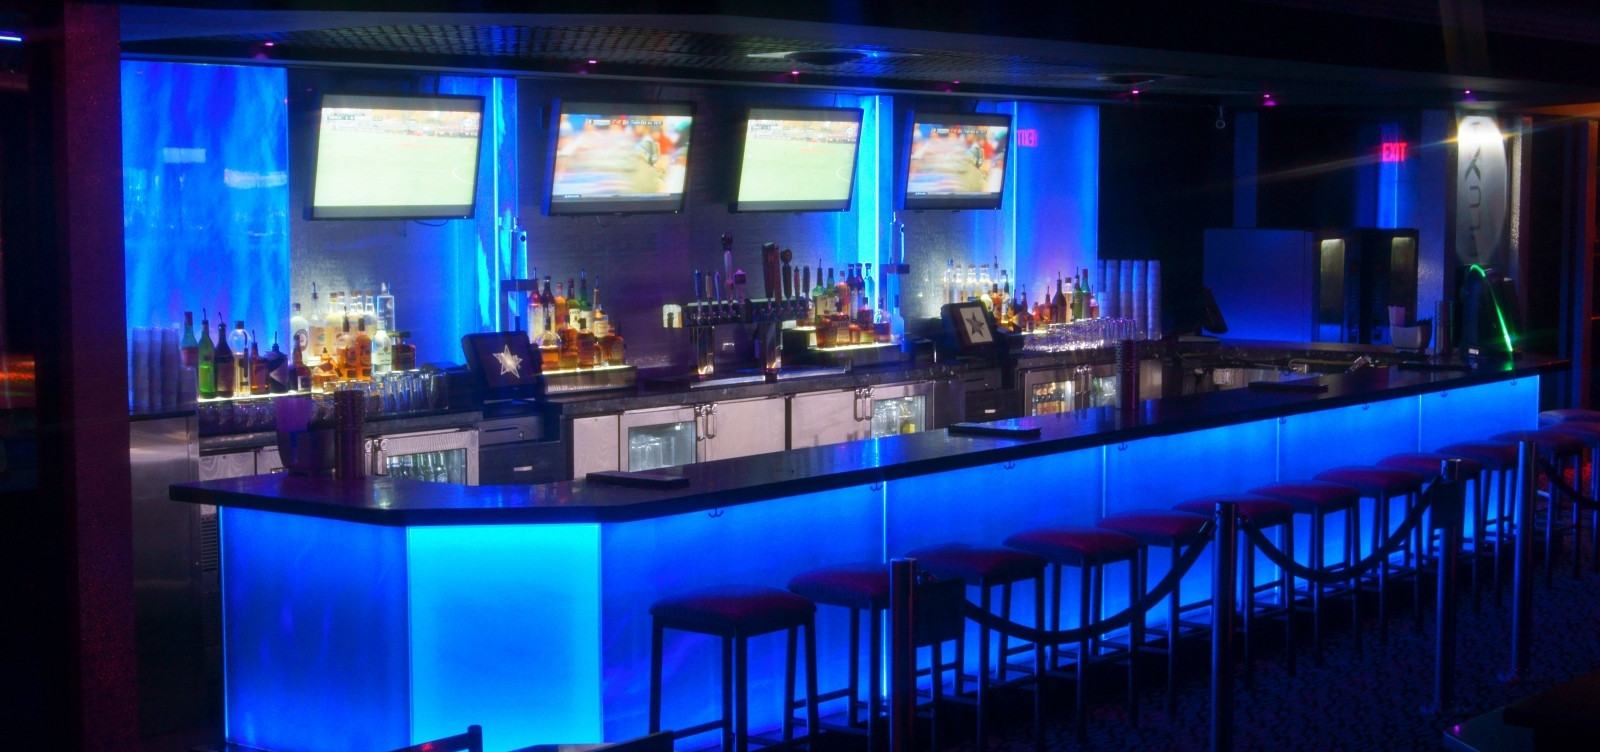 dynaled-club-disco-lighting-examples-3.j